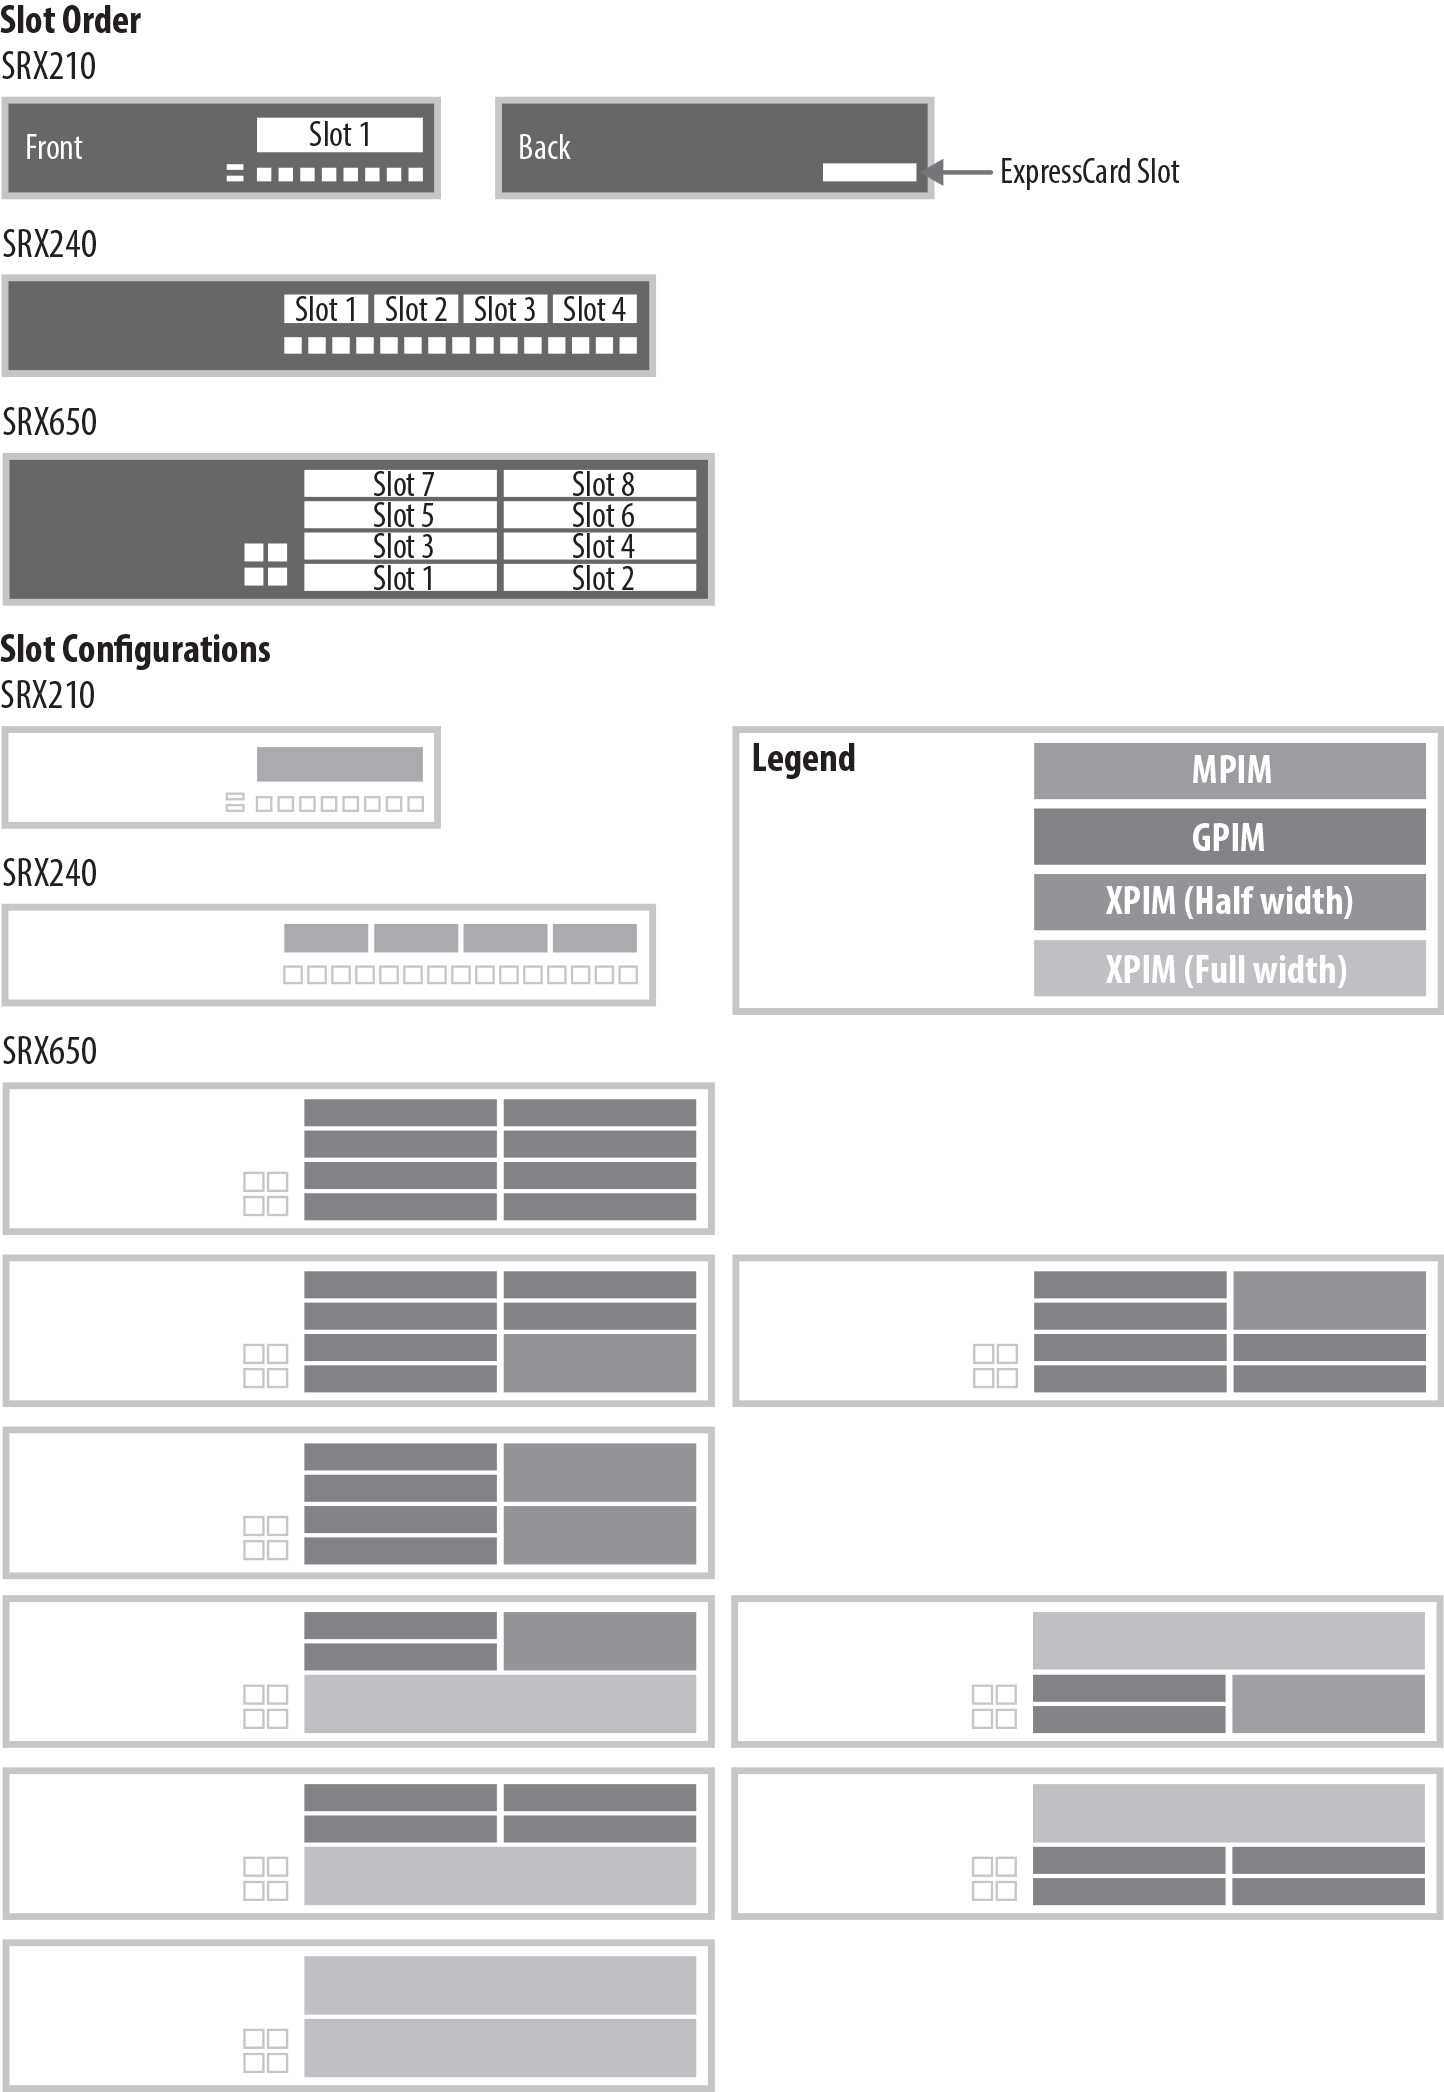 SRX650 PIM card diagram